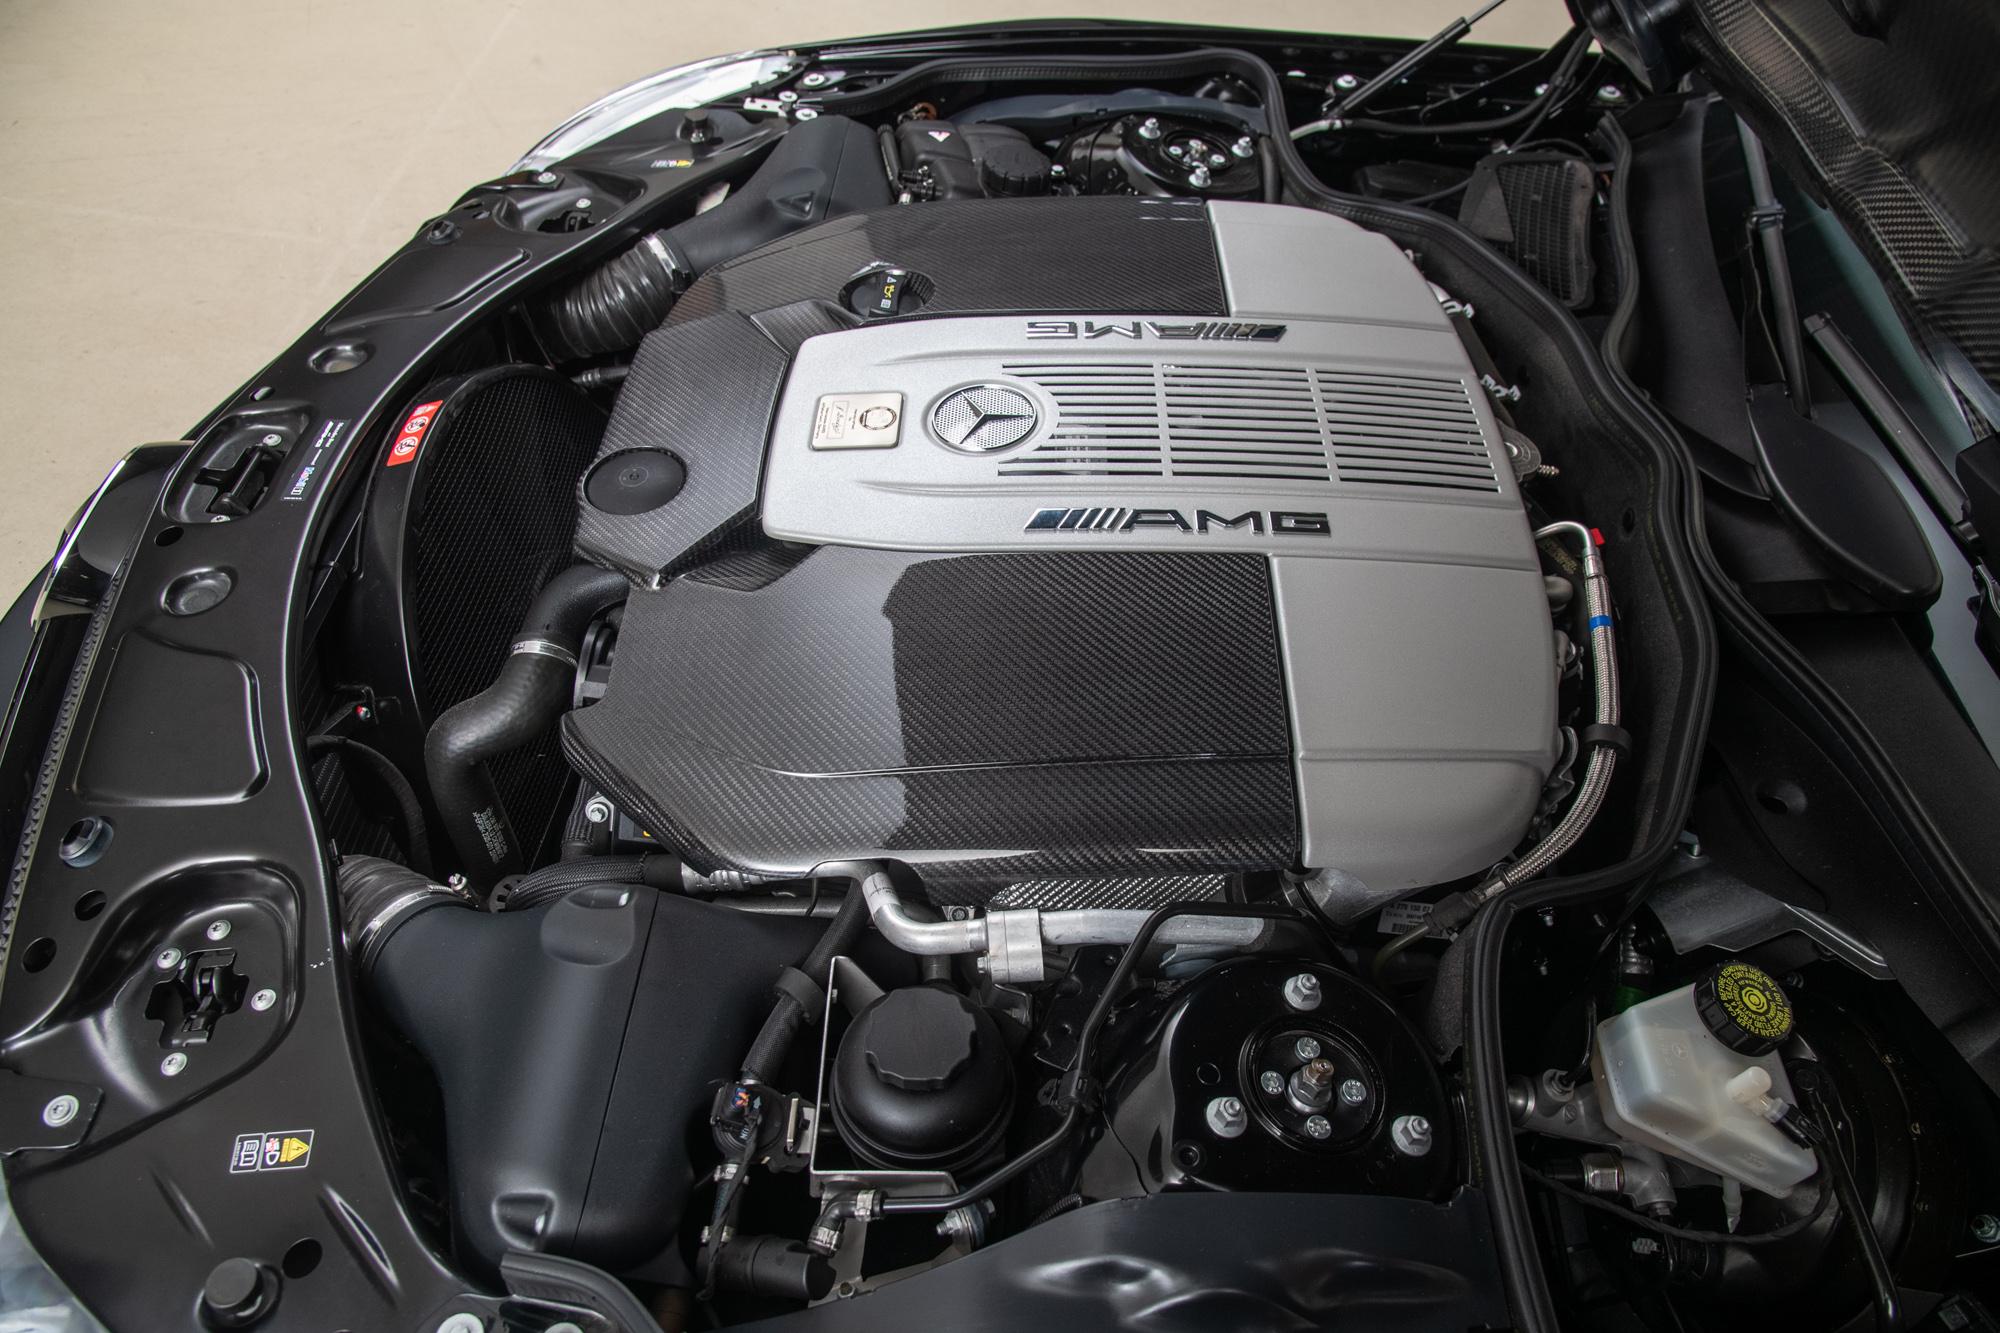 2009 Mercedes-Benz SL65 AMG Black Series , BLACK, VIN WDBSK79F39F158215, MILEAGE 6838